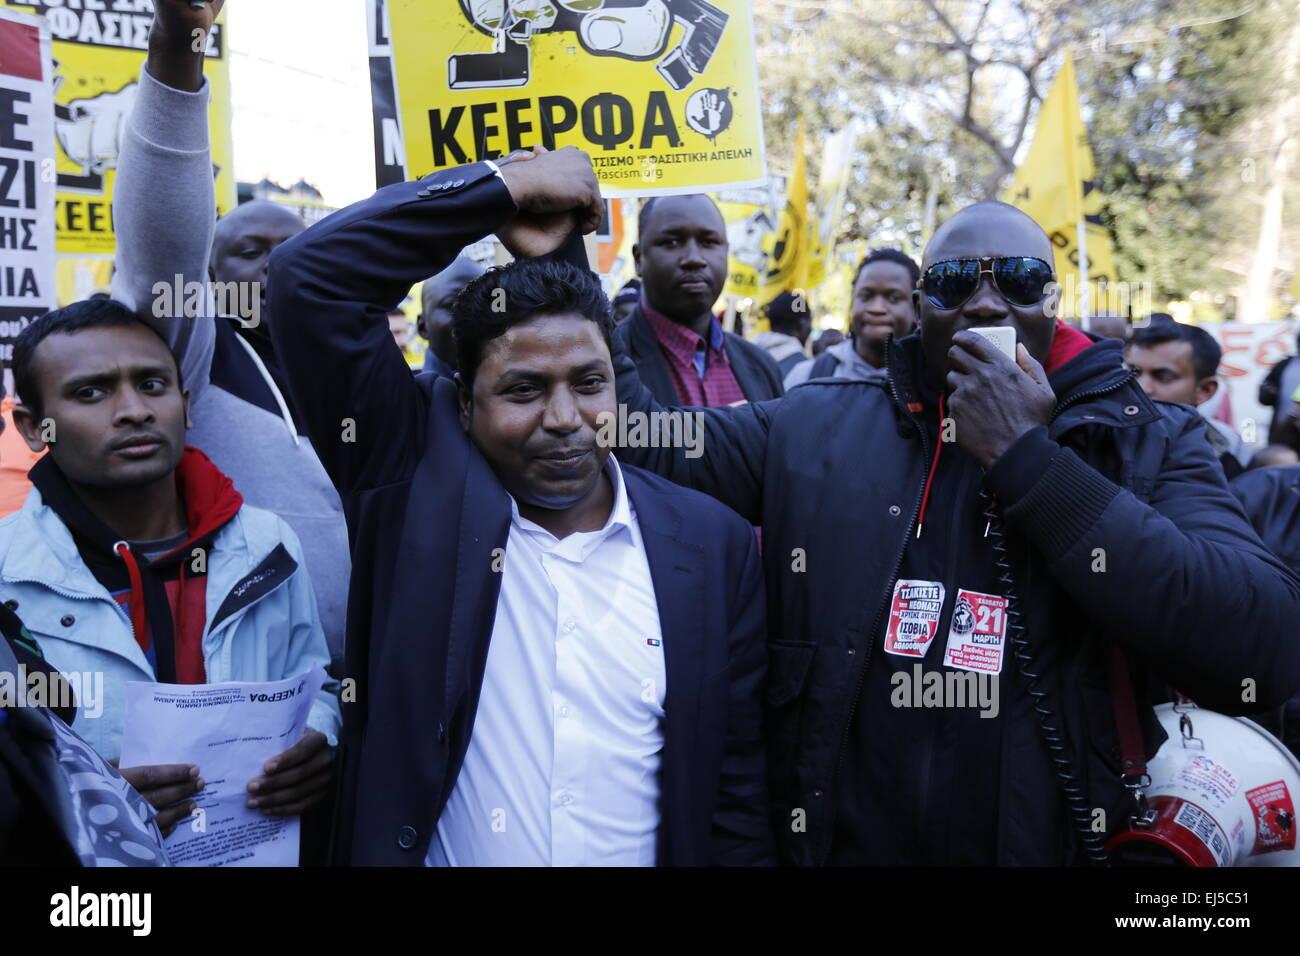 Athens, Greece. 21st Mar, 2015. Immigrants shout slogans against rasicsm. ANTARSYA (Anticapitalist Left Cooperation - Stock Image